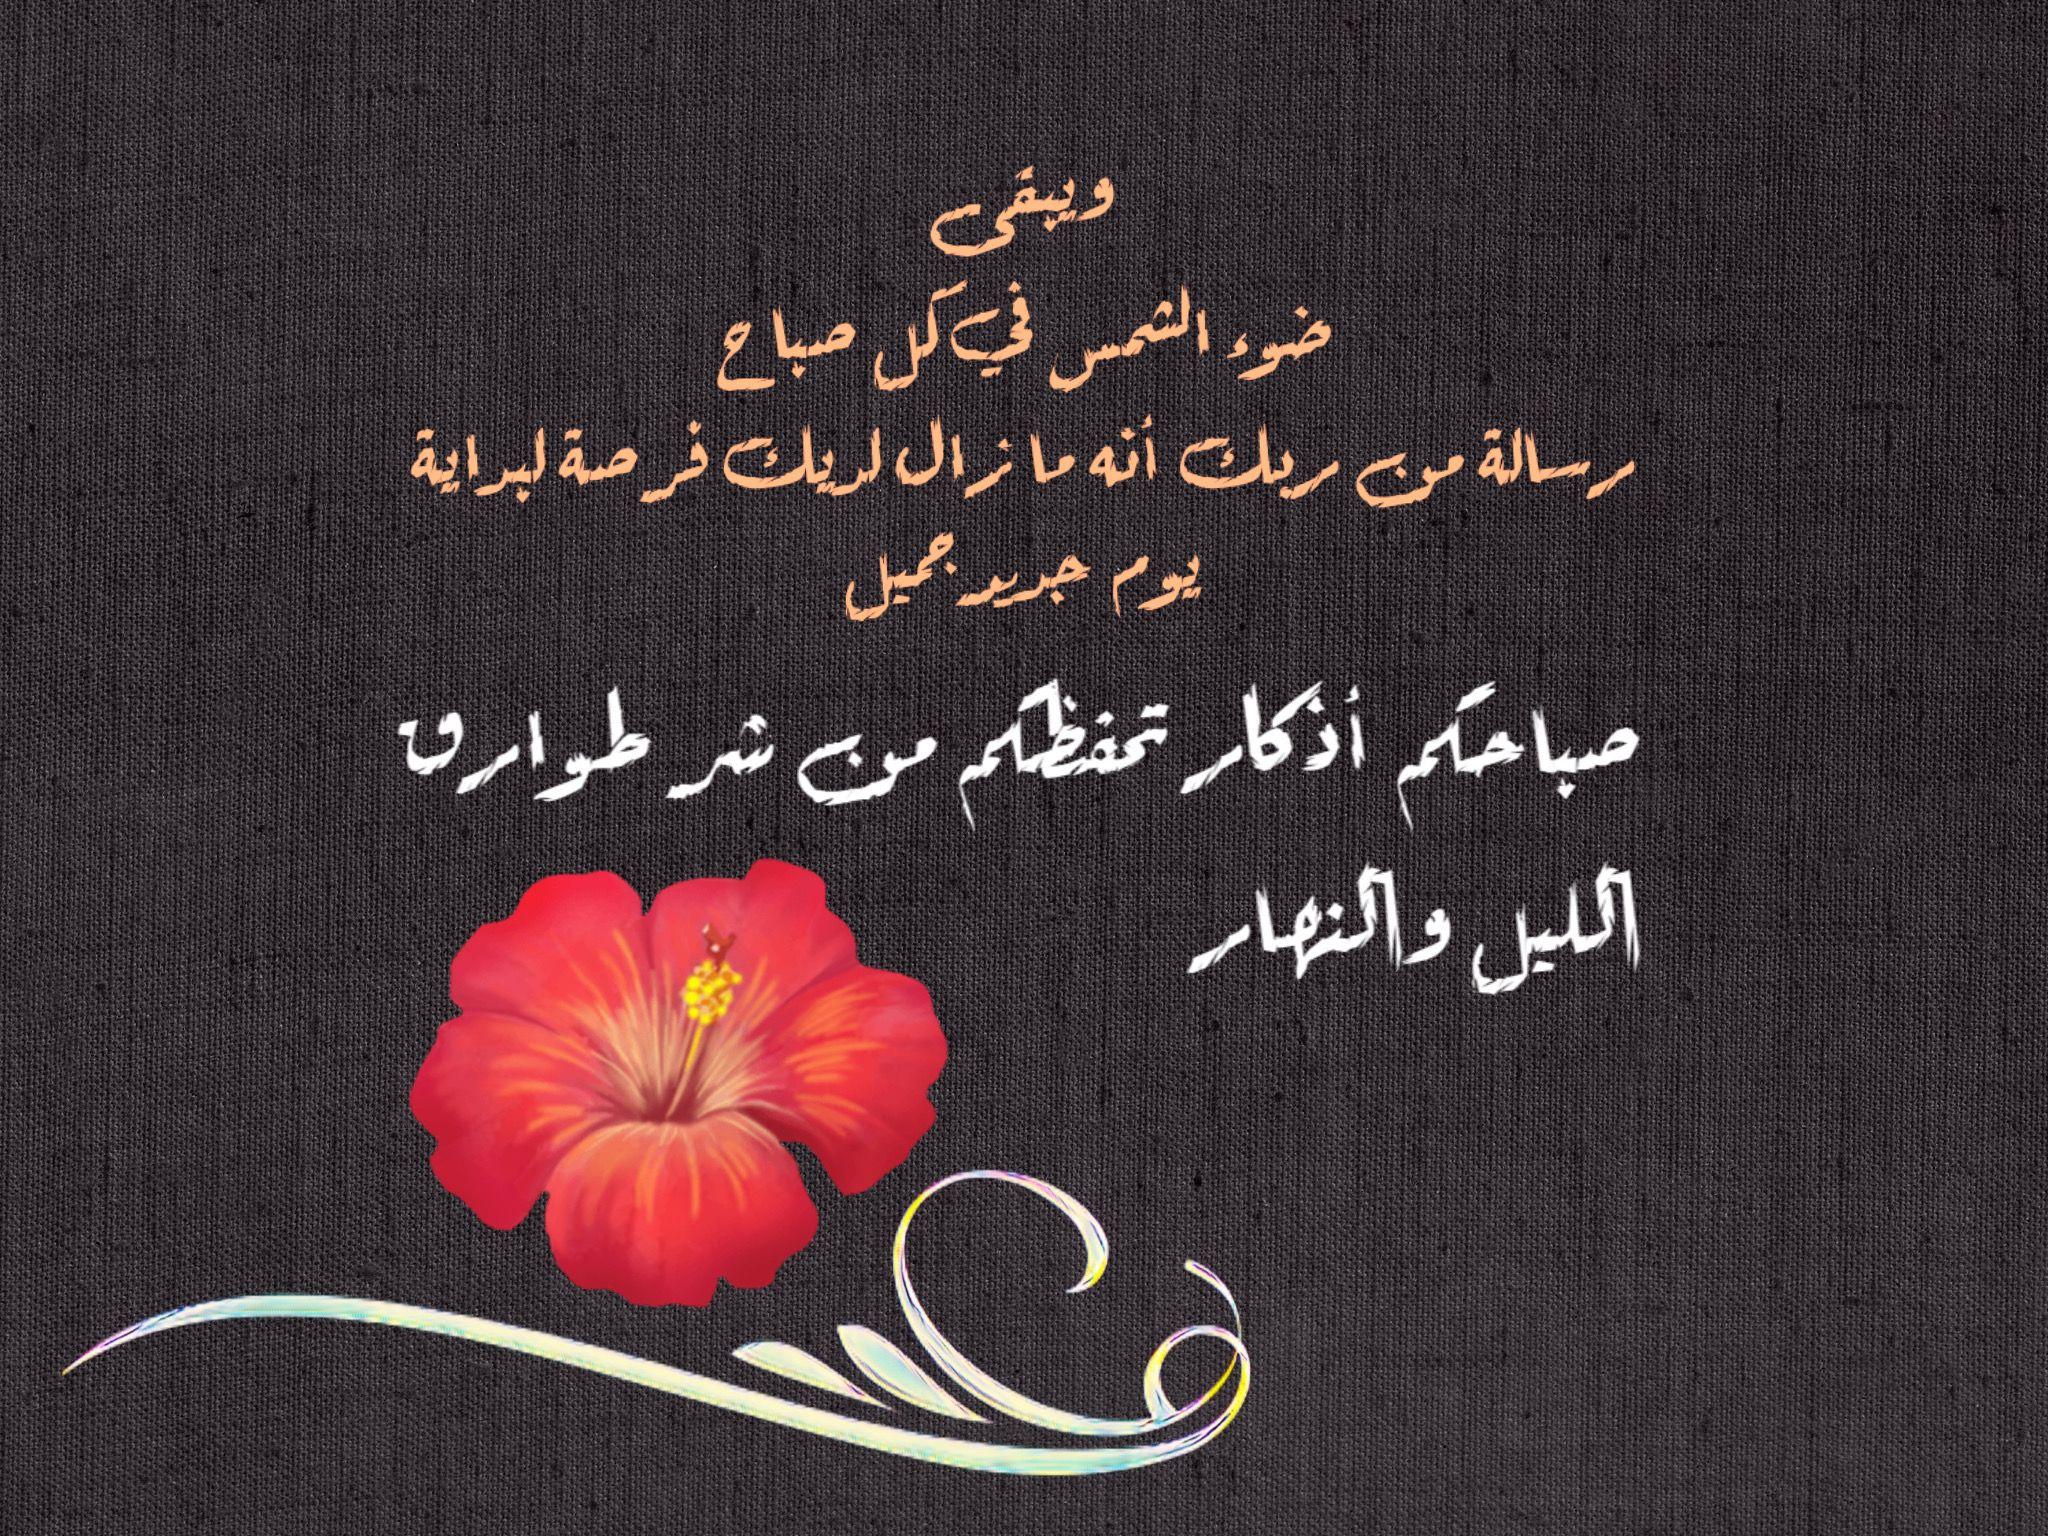 Pin By Masoud Al Nuamani On صباح مساء Chalkboard Quote Art Art Quotes Chalkboard Quotes